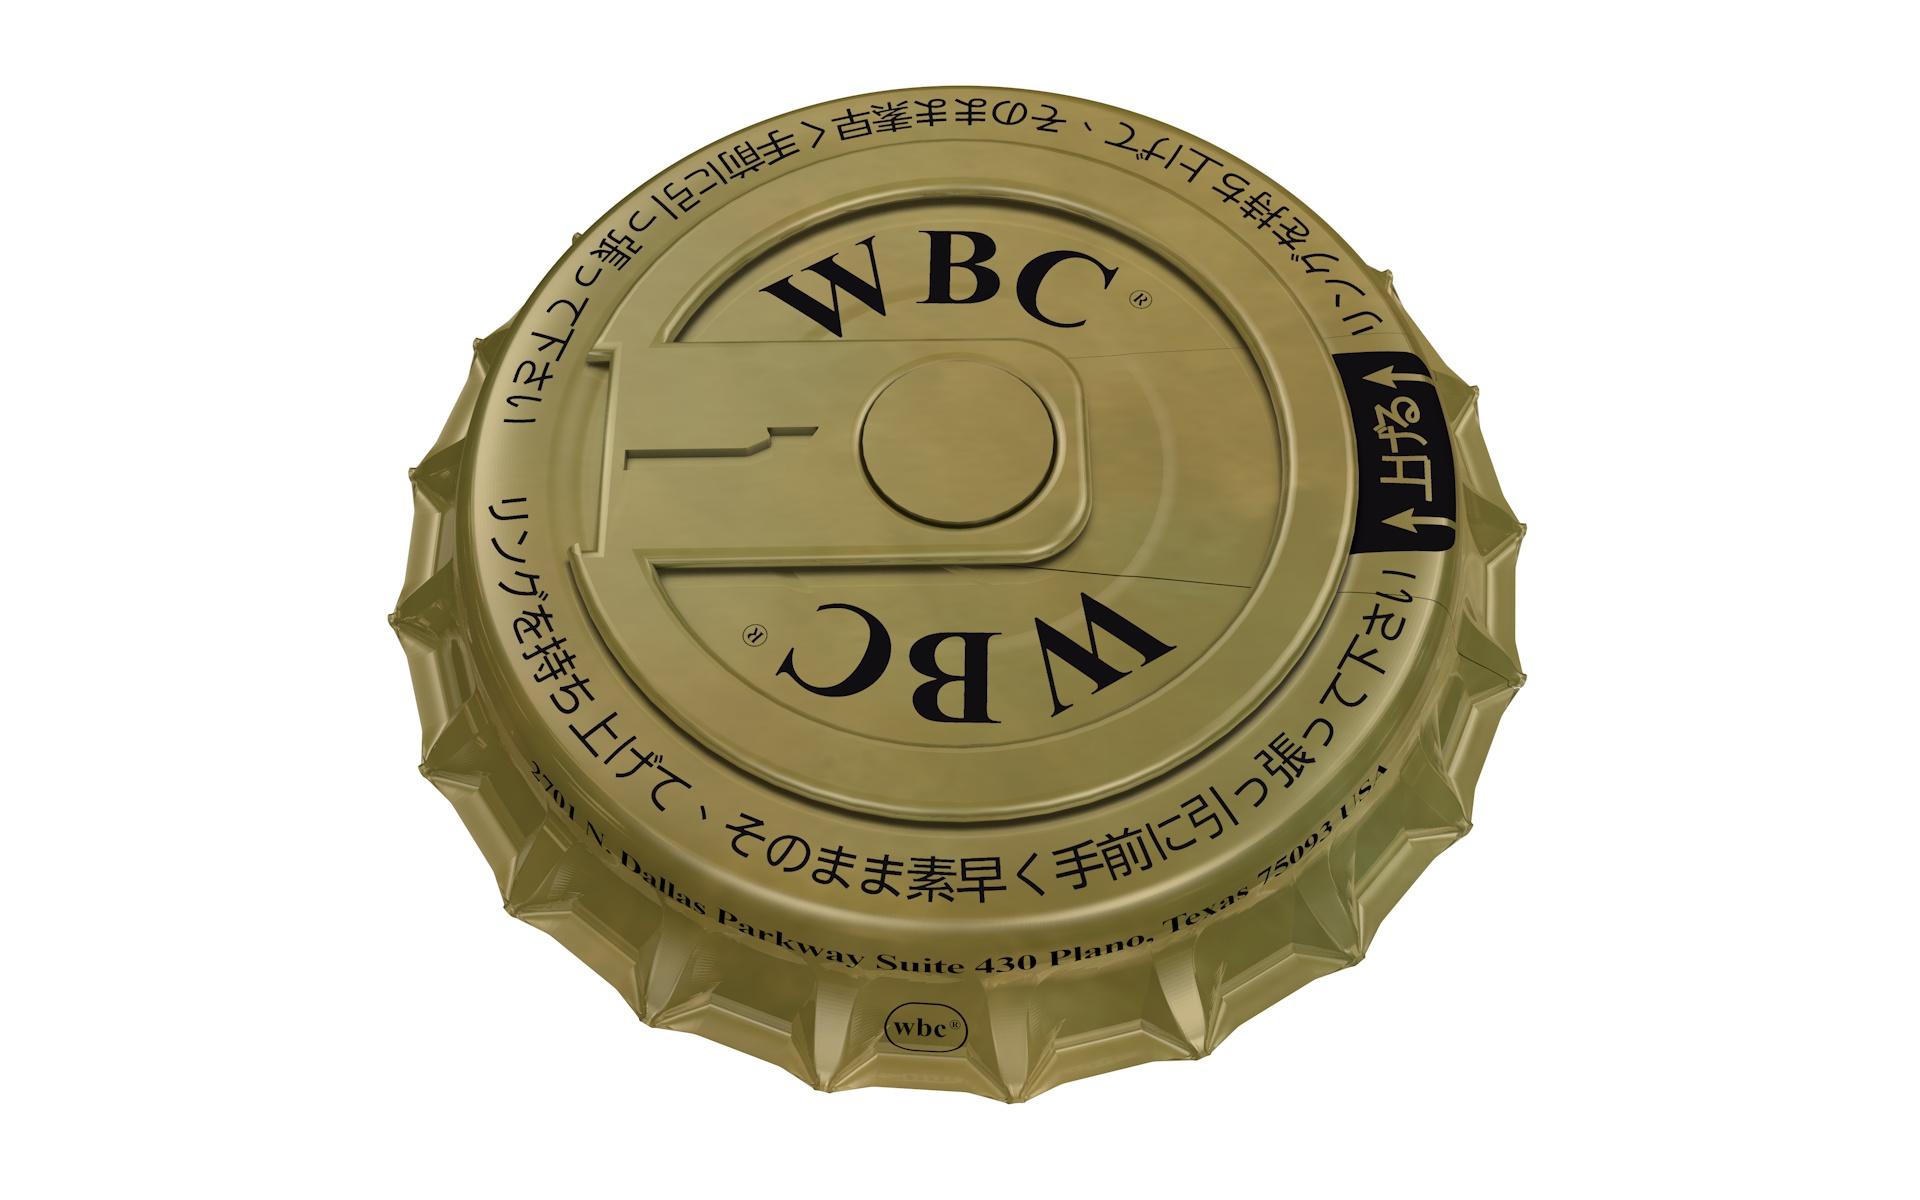 epbc-wbc-lift-ar-jpn-002_0000